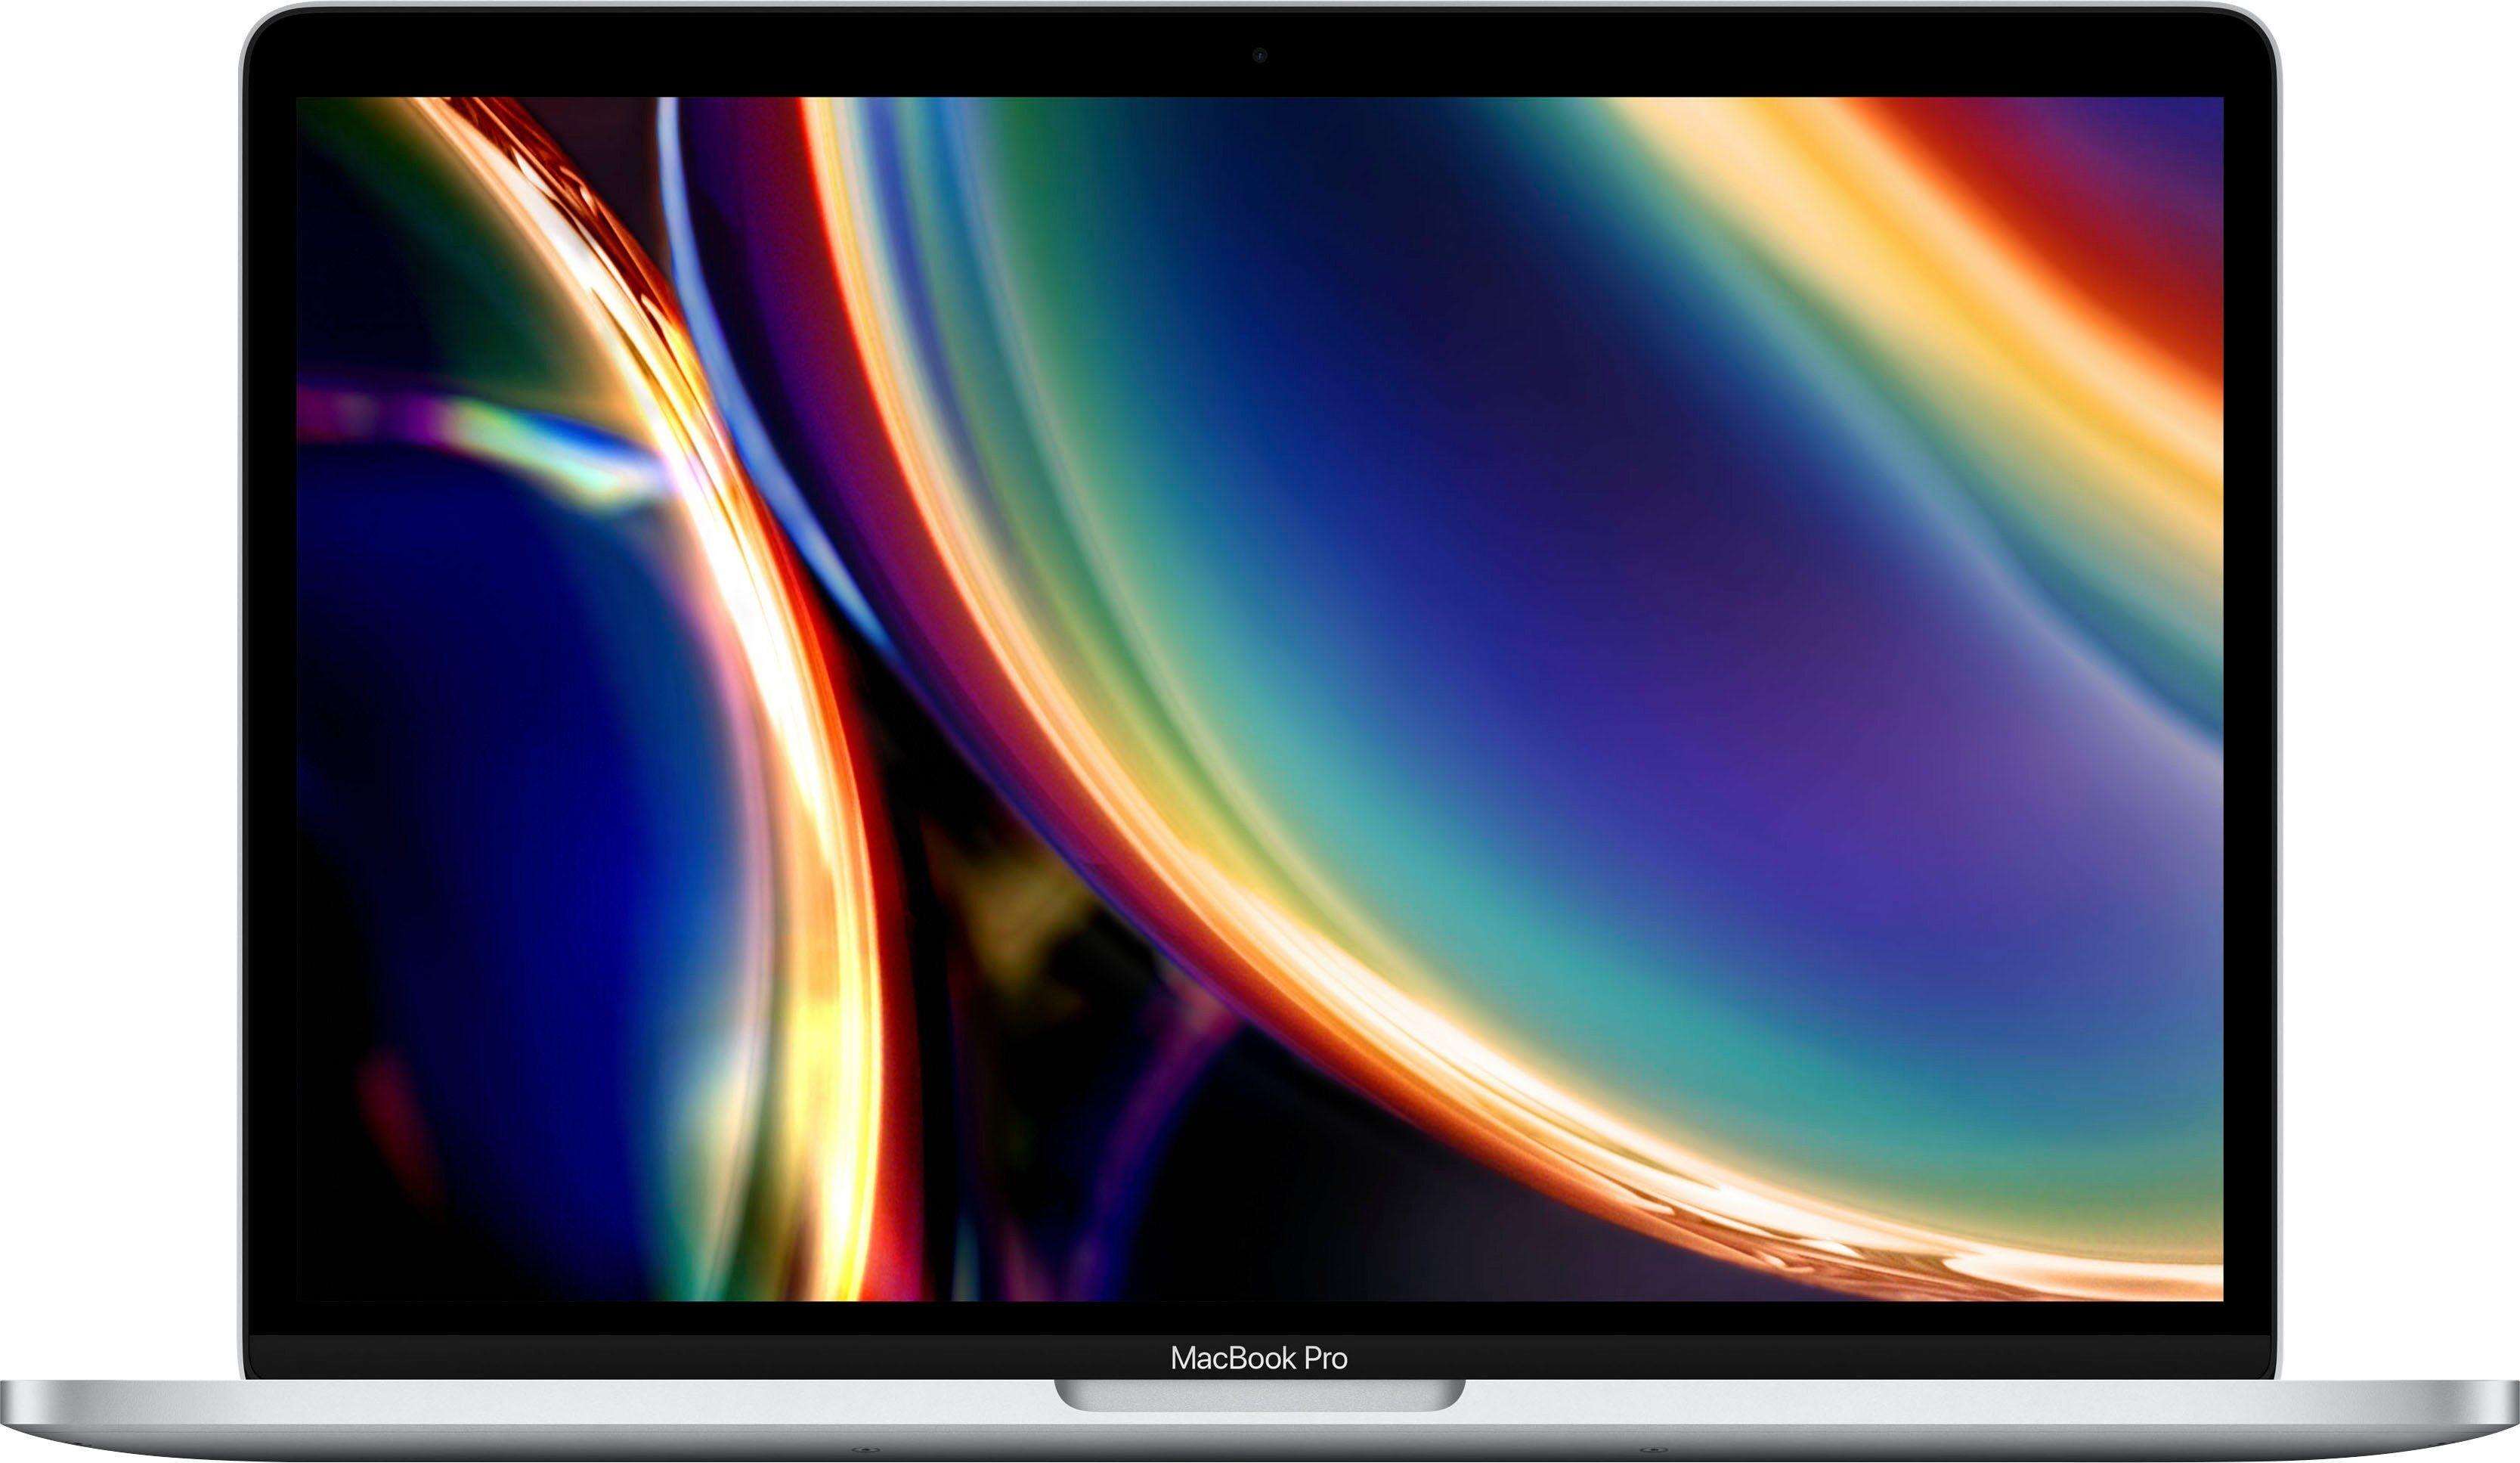 Apple MacBook Pro Notebook (33,78 cm/13,3 Zoll, Intel Core i5, Iris Plus Graphics 645, - GB HDD, 512 GB SSD), Silber